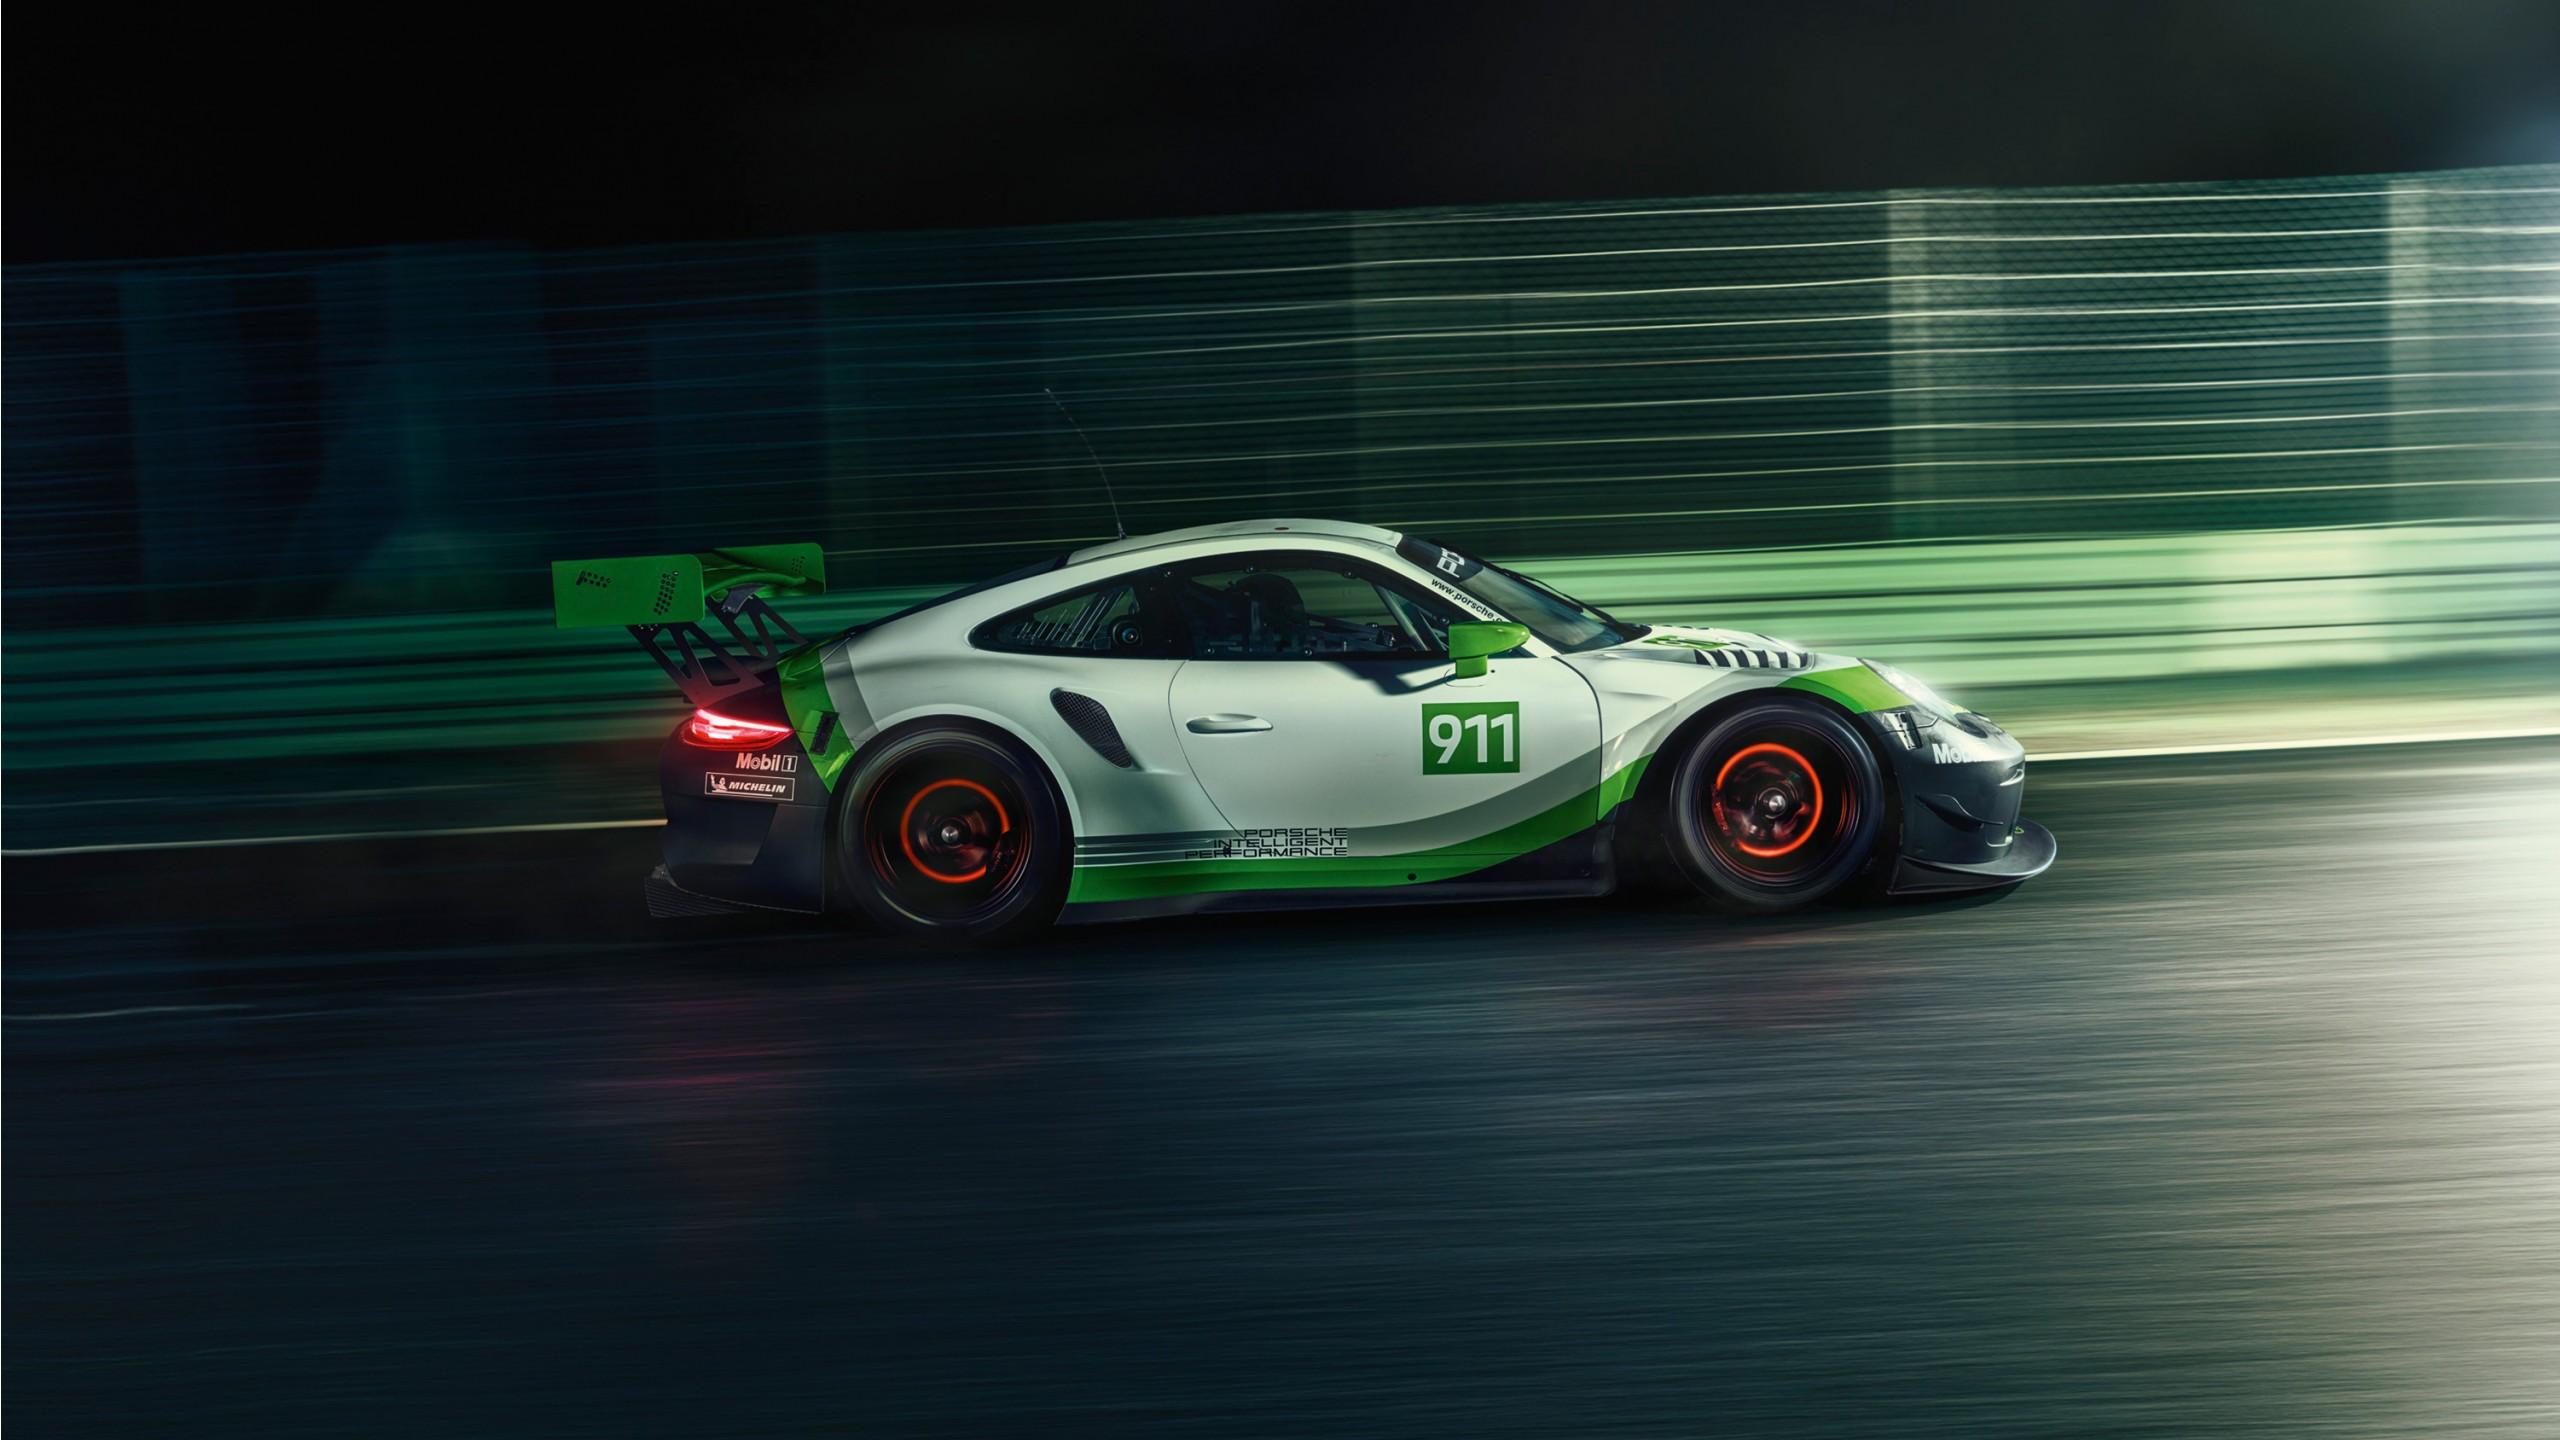 Toyota Route 4 >> 2019 Porsche 911 GT3 R 4K 3 Wallpaper | HD Car Wallpapers | ID #10350